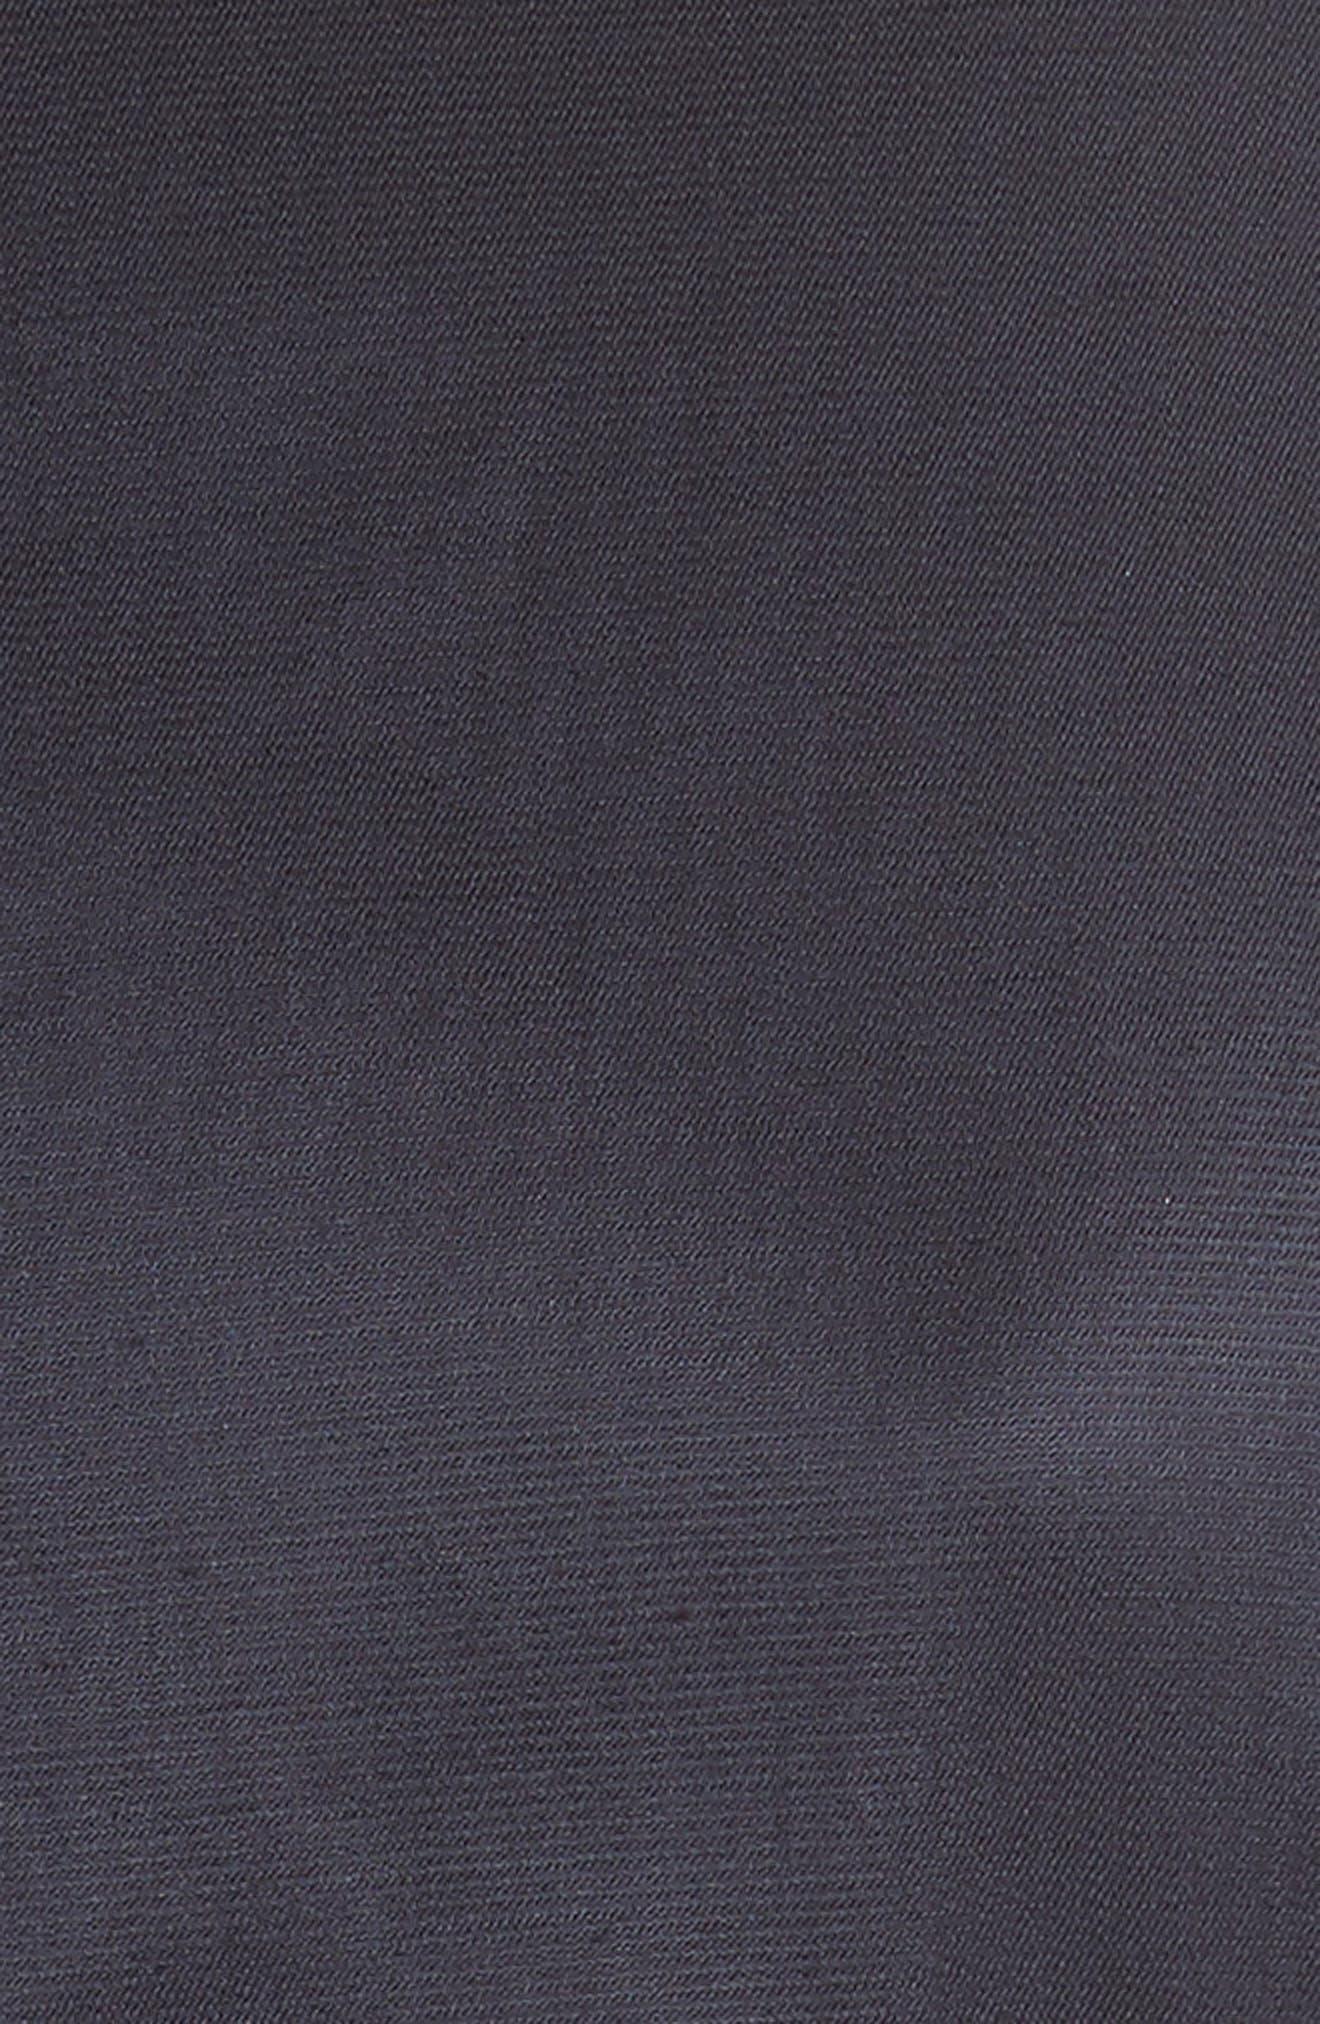 Broken Sateen Jumpsuit,                             Alternate thumbnail 5, color,                             Blue Stone